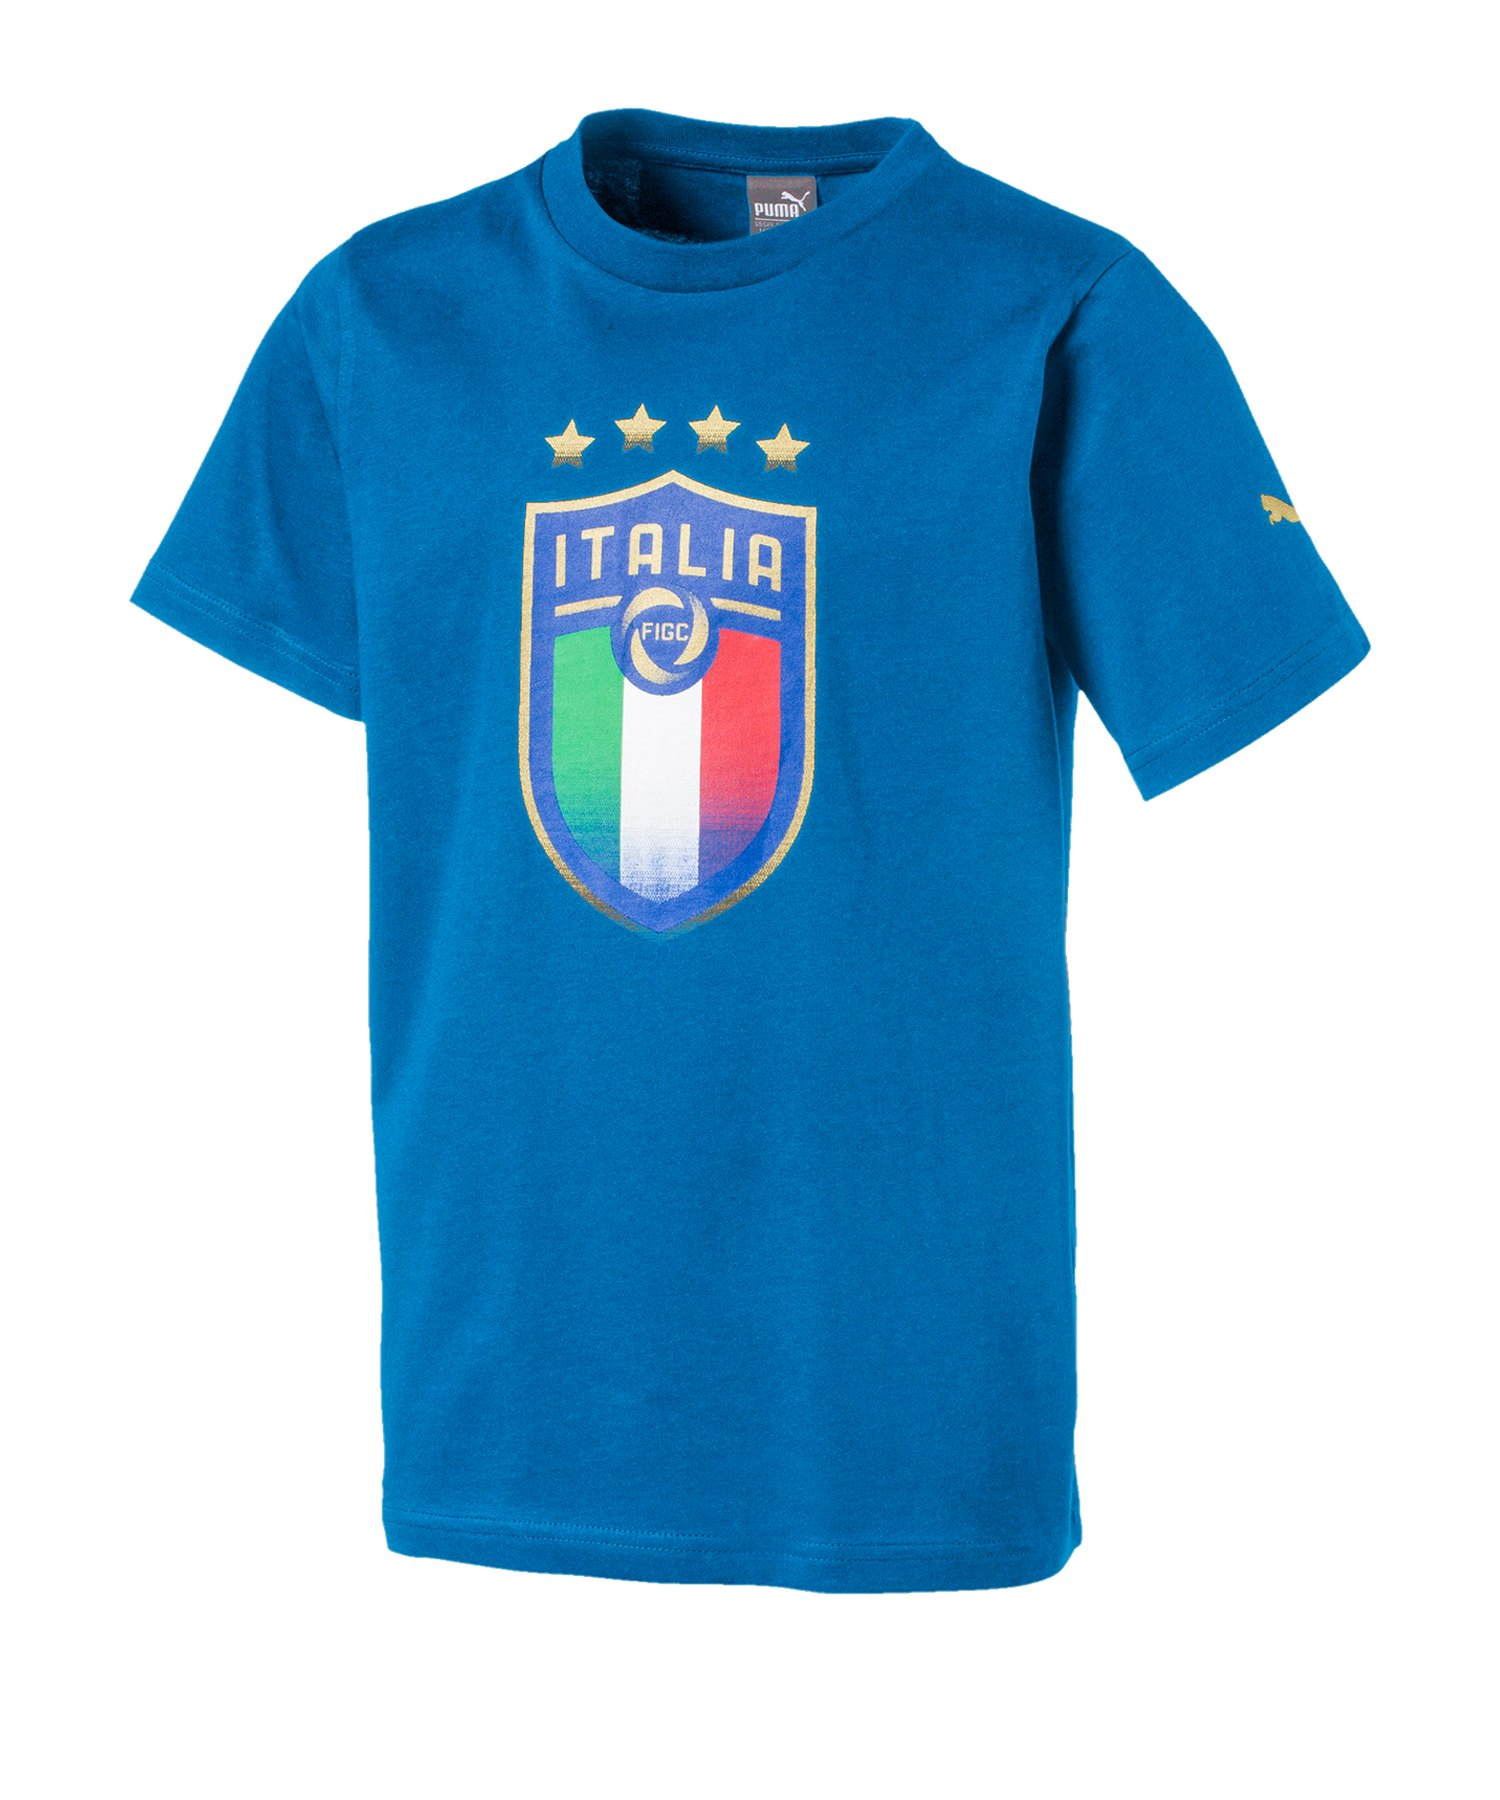 PUMA Italien Badge T-Shirt Kids Blau F01 - blau